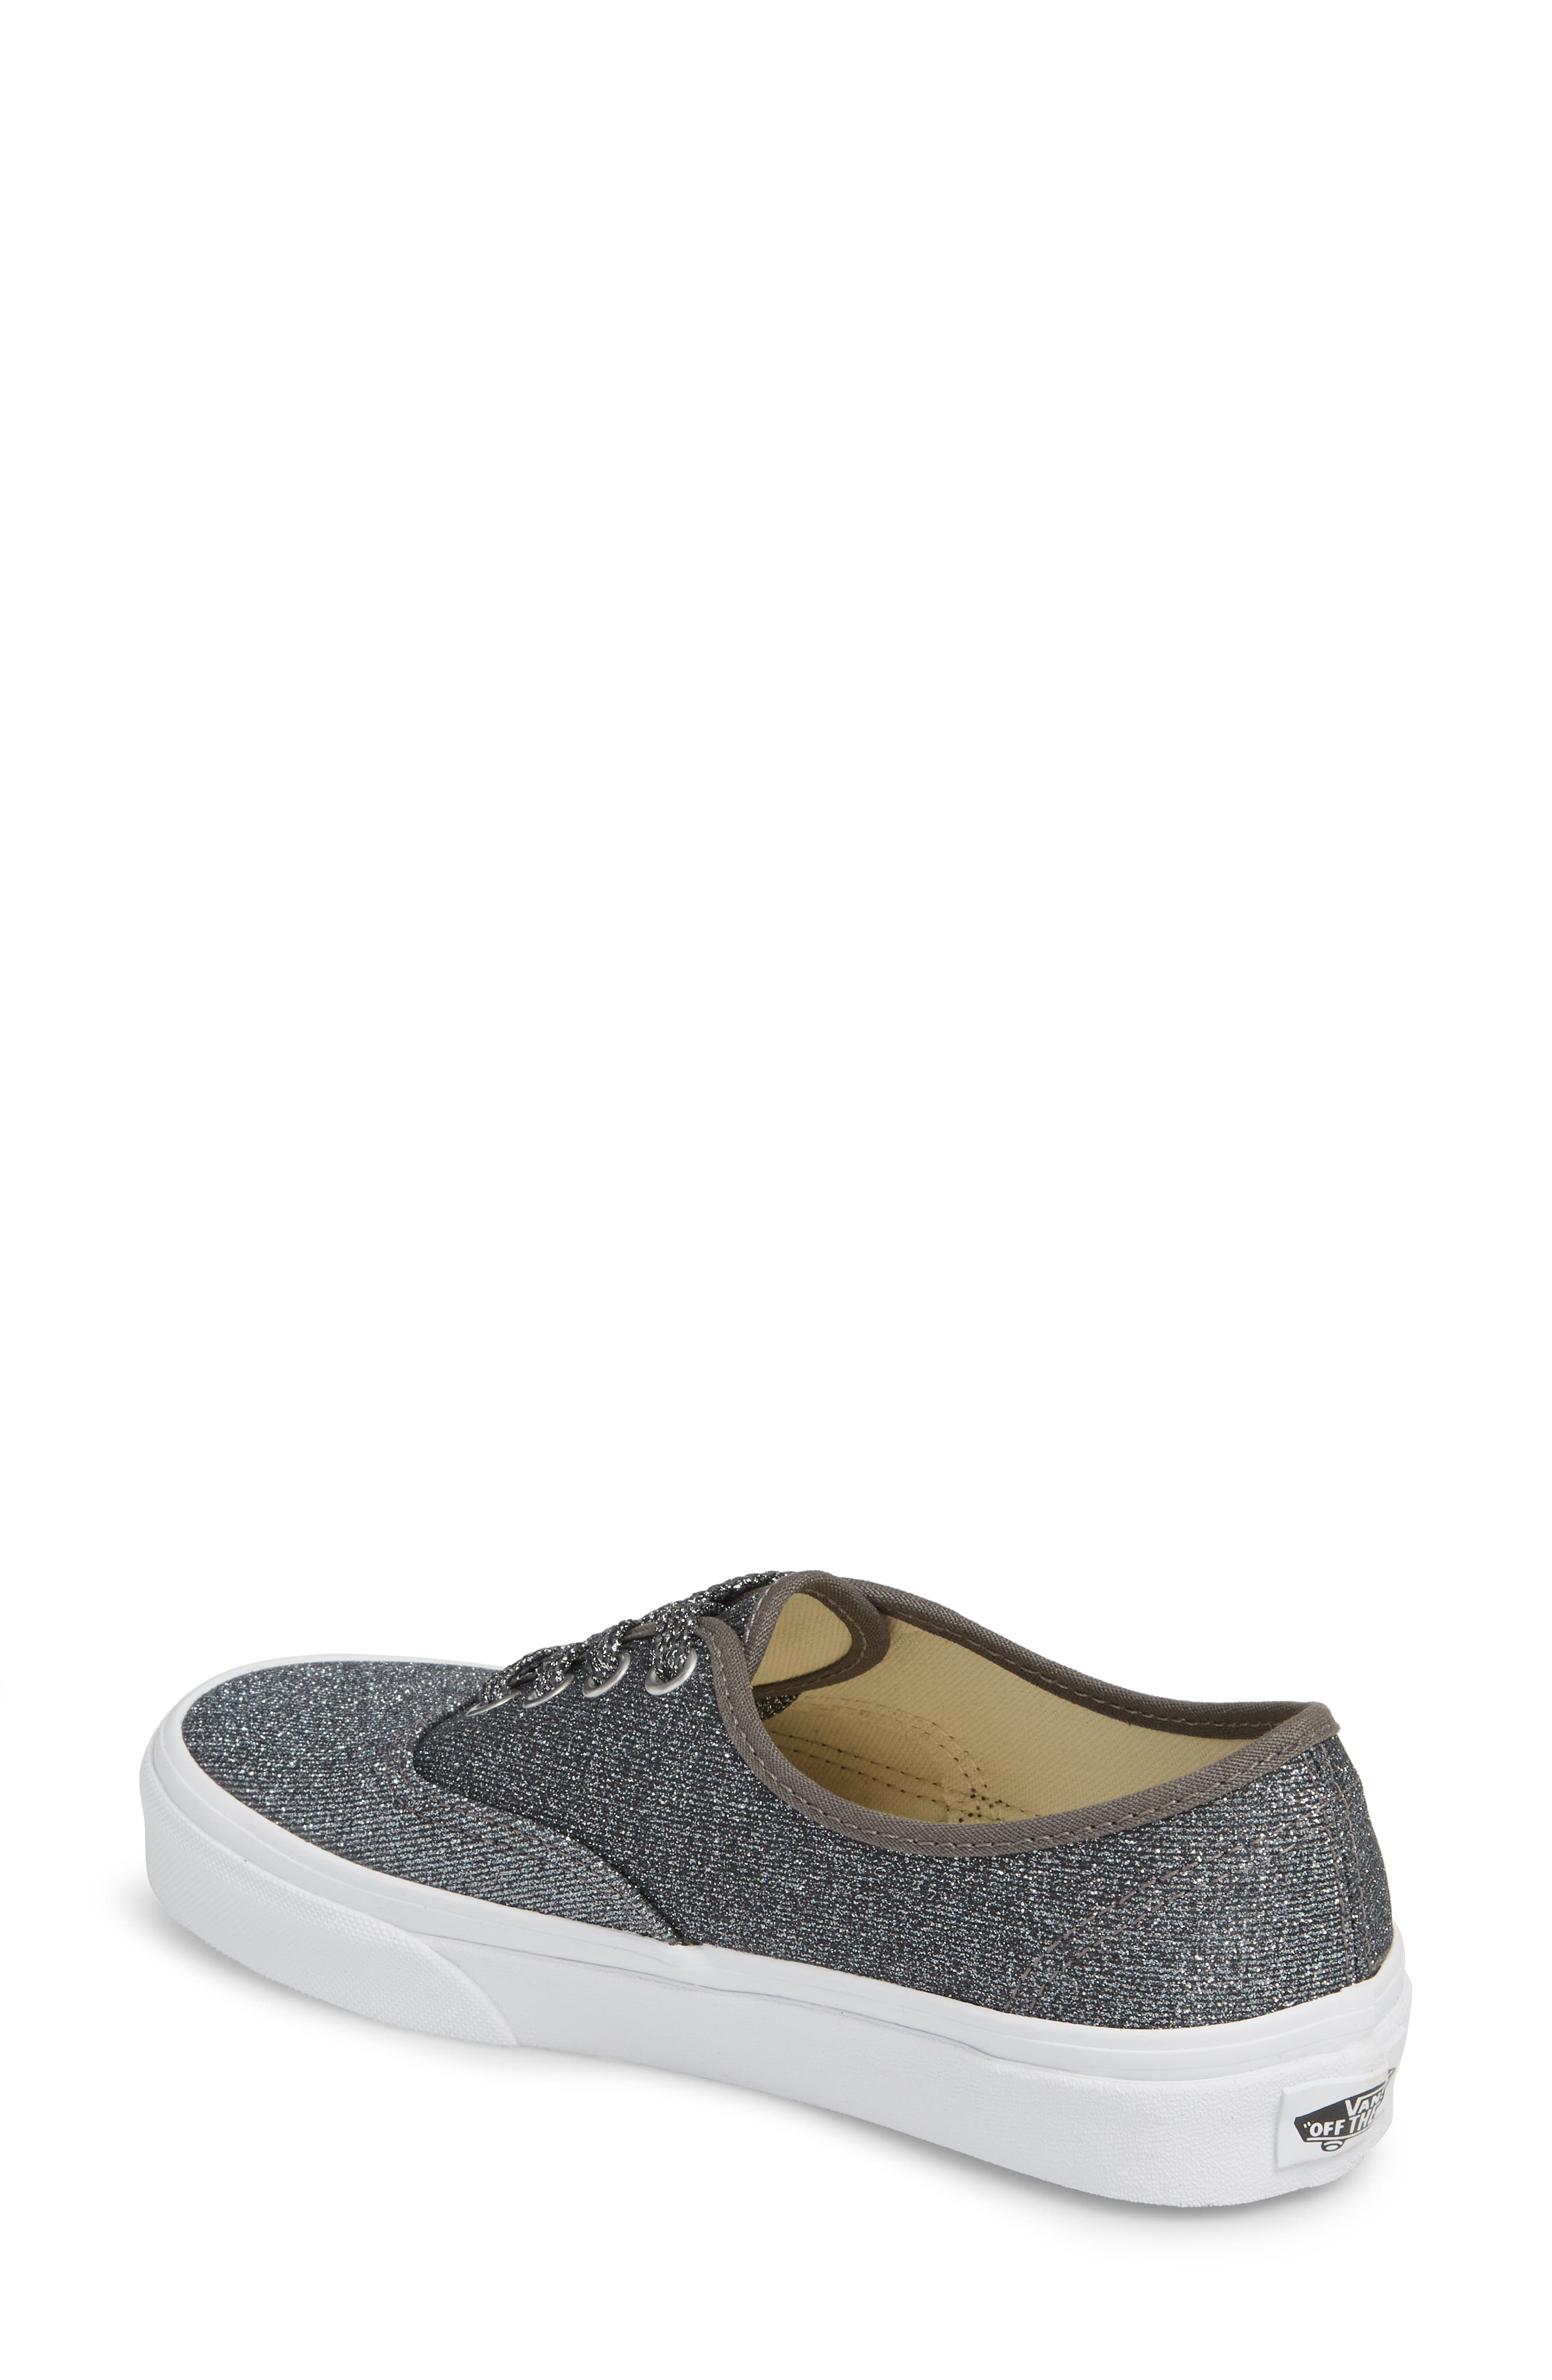 UA Authentic Lurex Sneaker,                             Alternate thumbnail 2, color,                             BLACK/ TRUE WHITE GLITTER